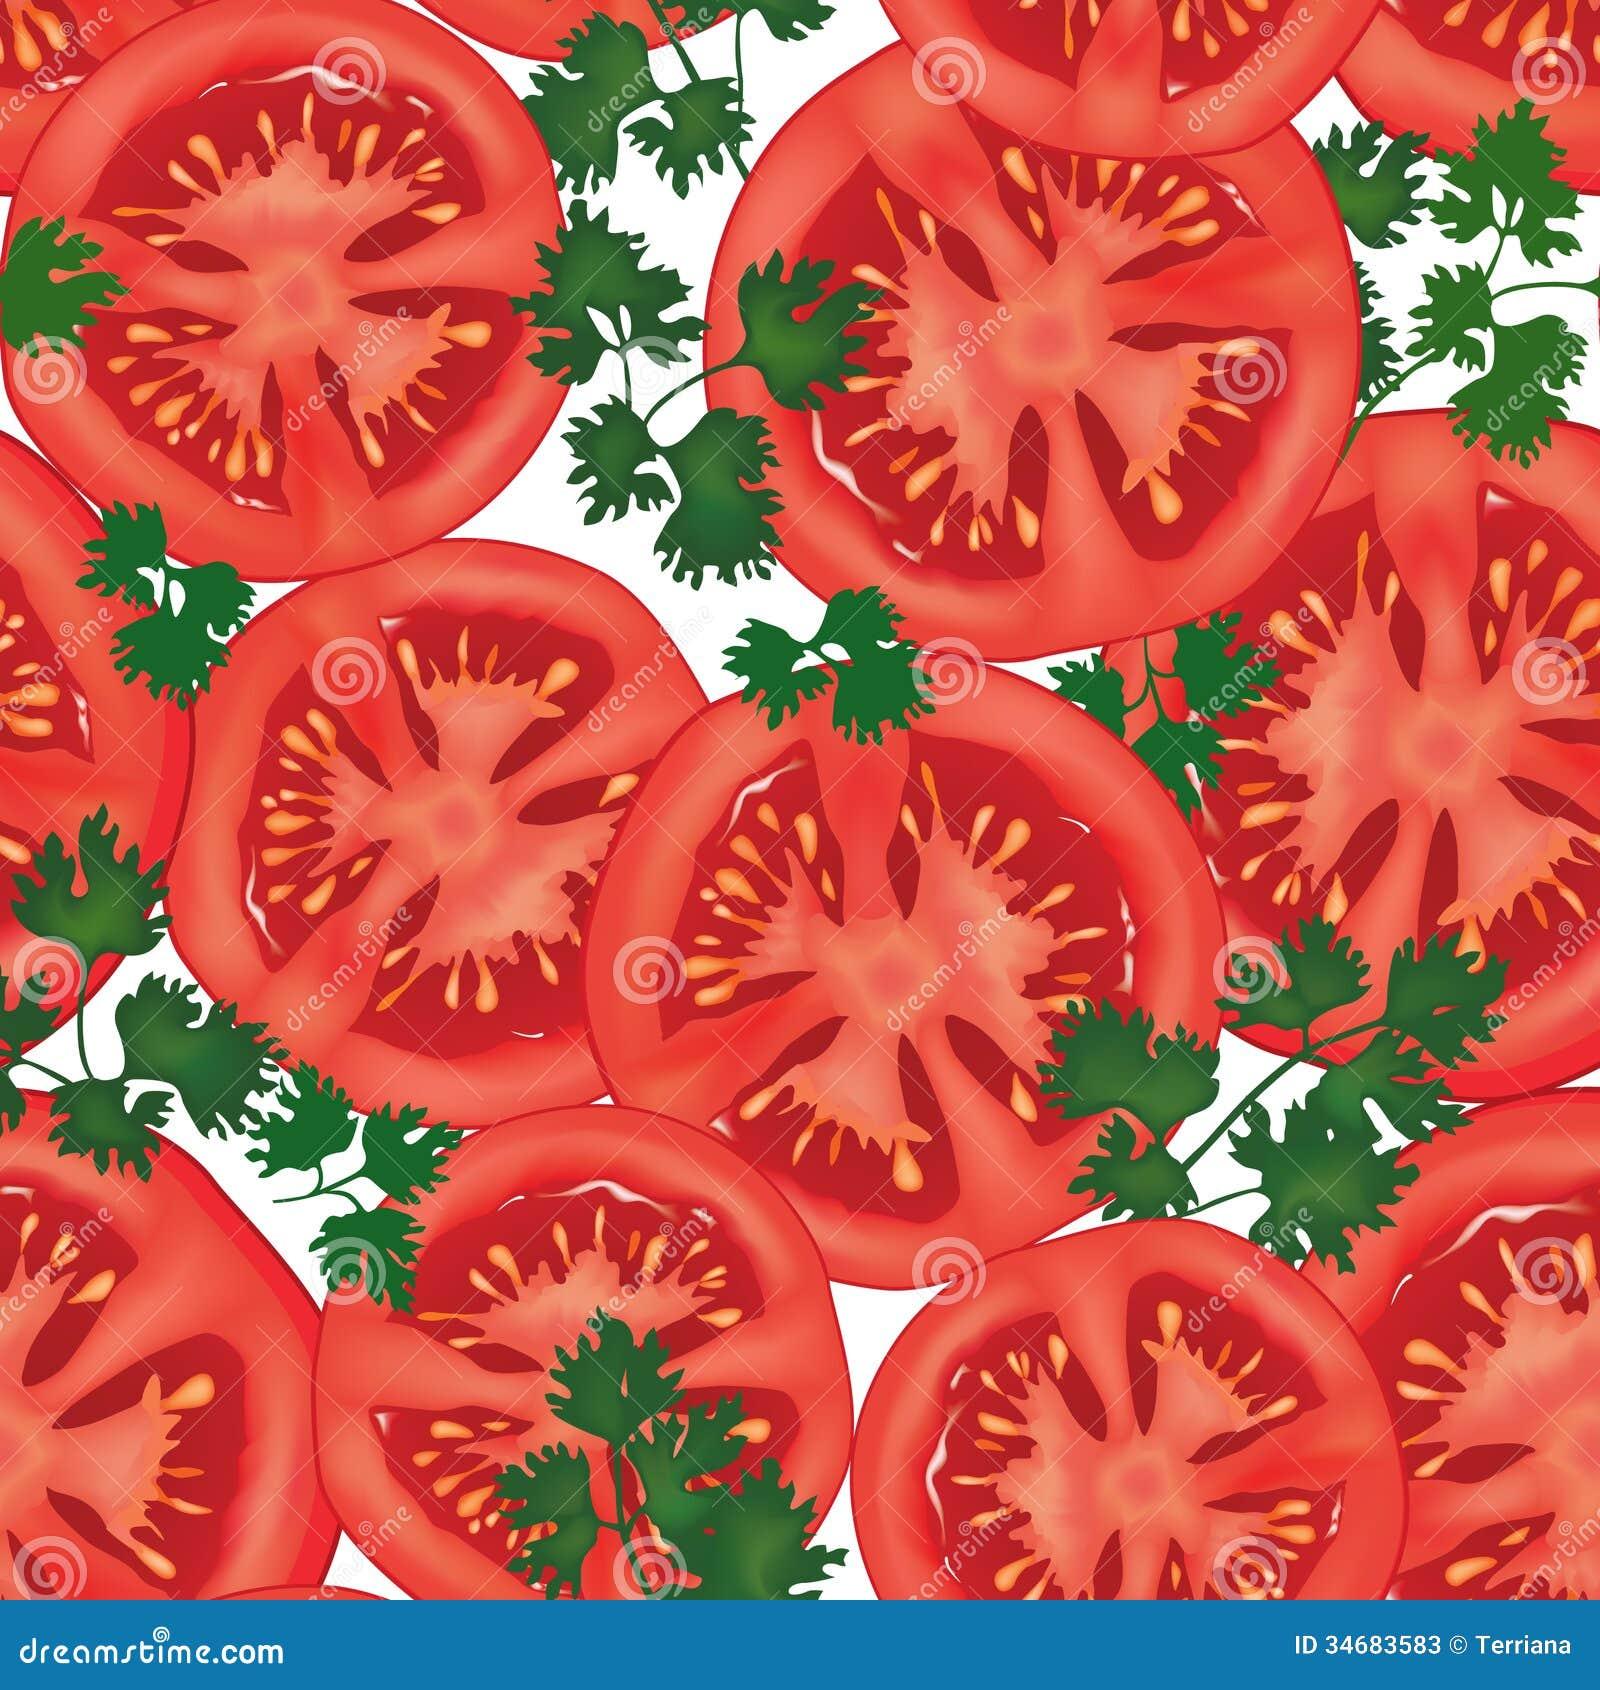 Big ripe red fresh tomato seamless background